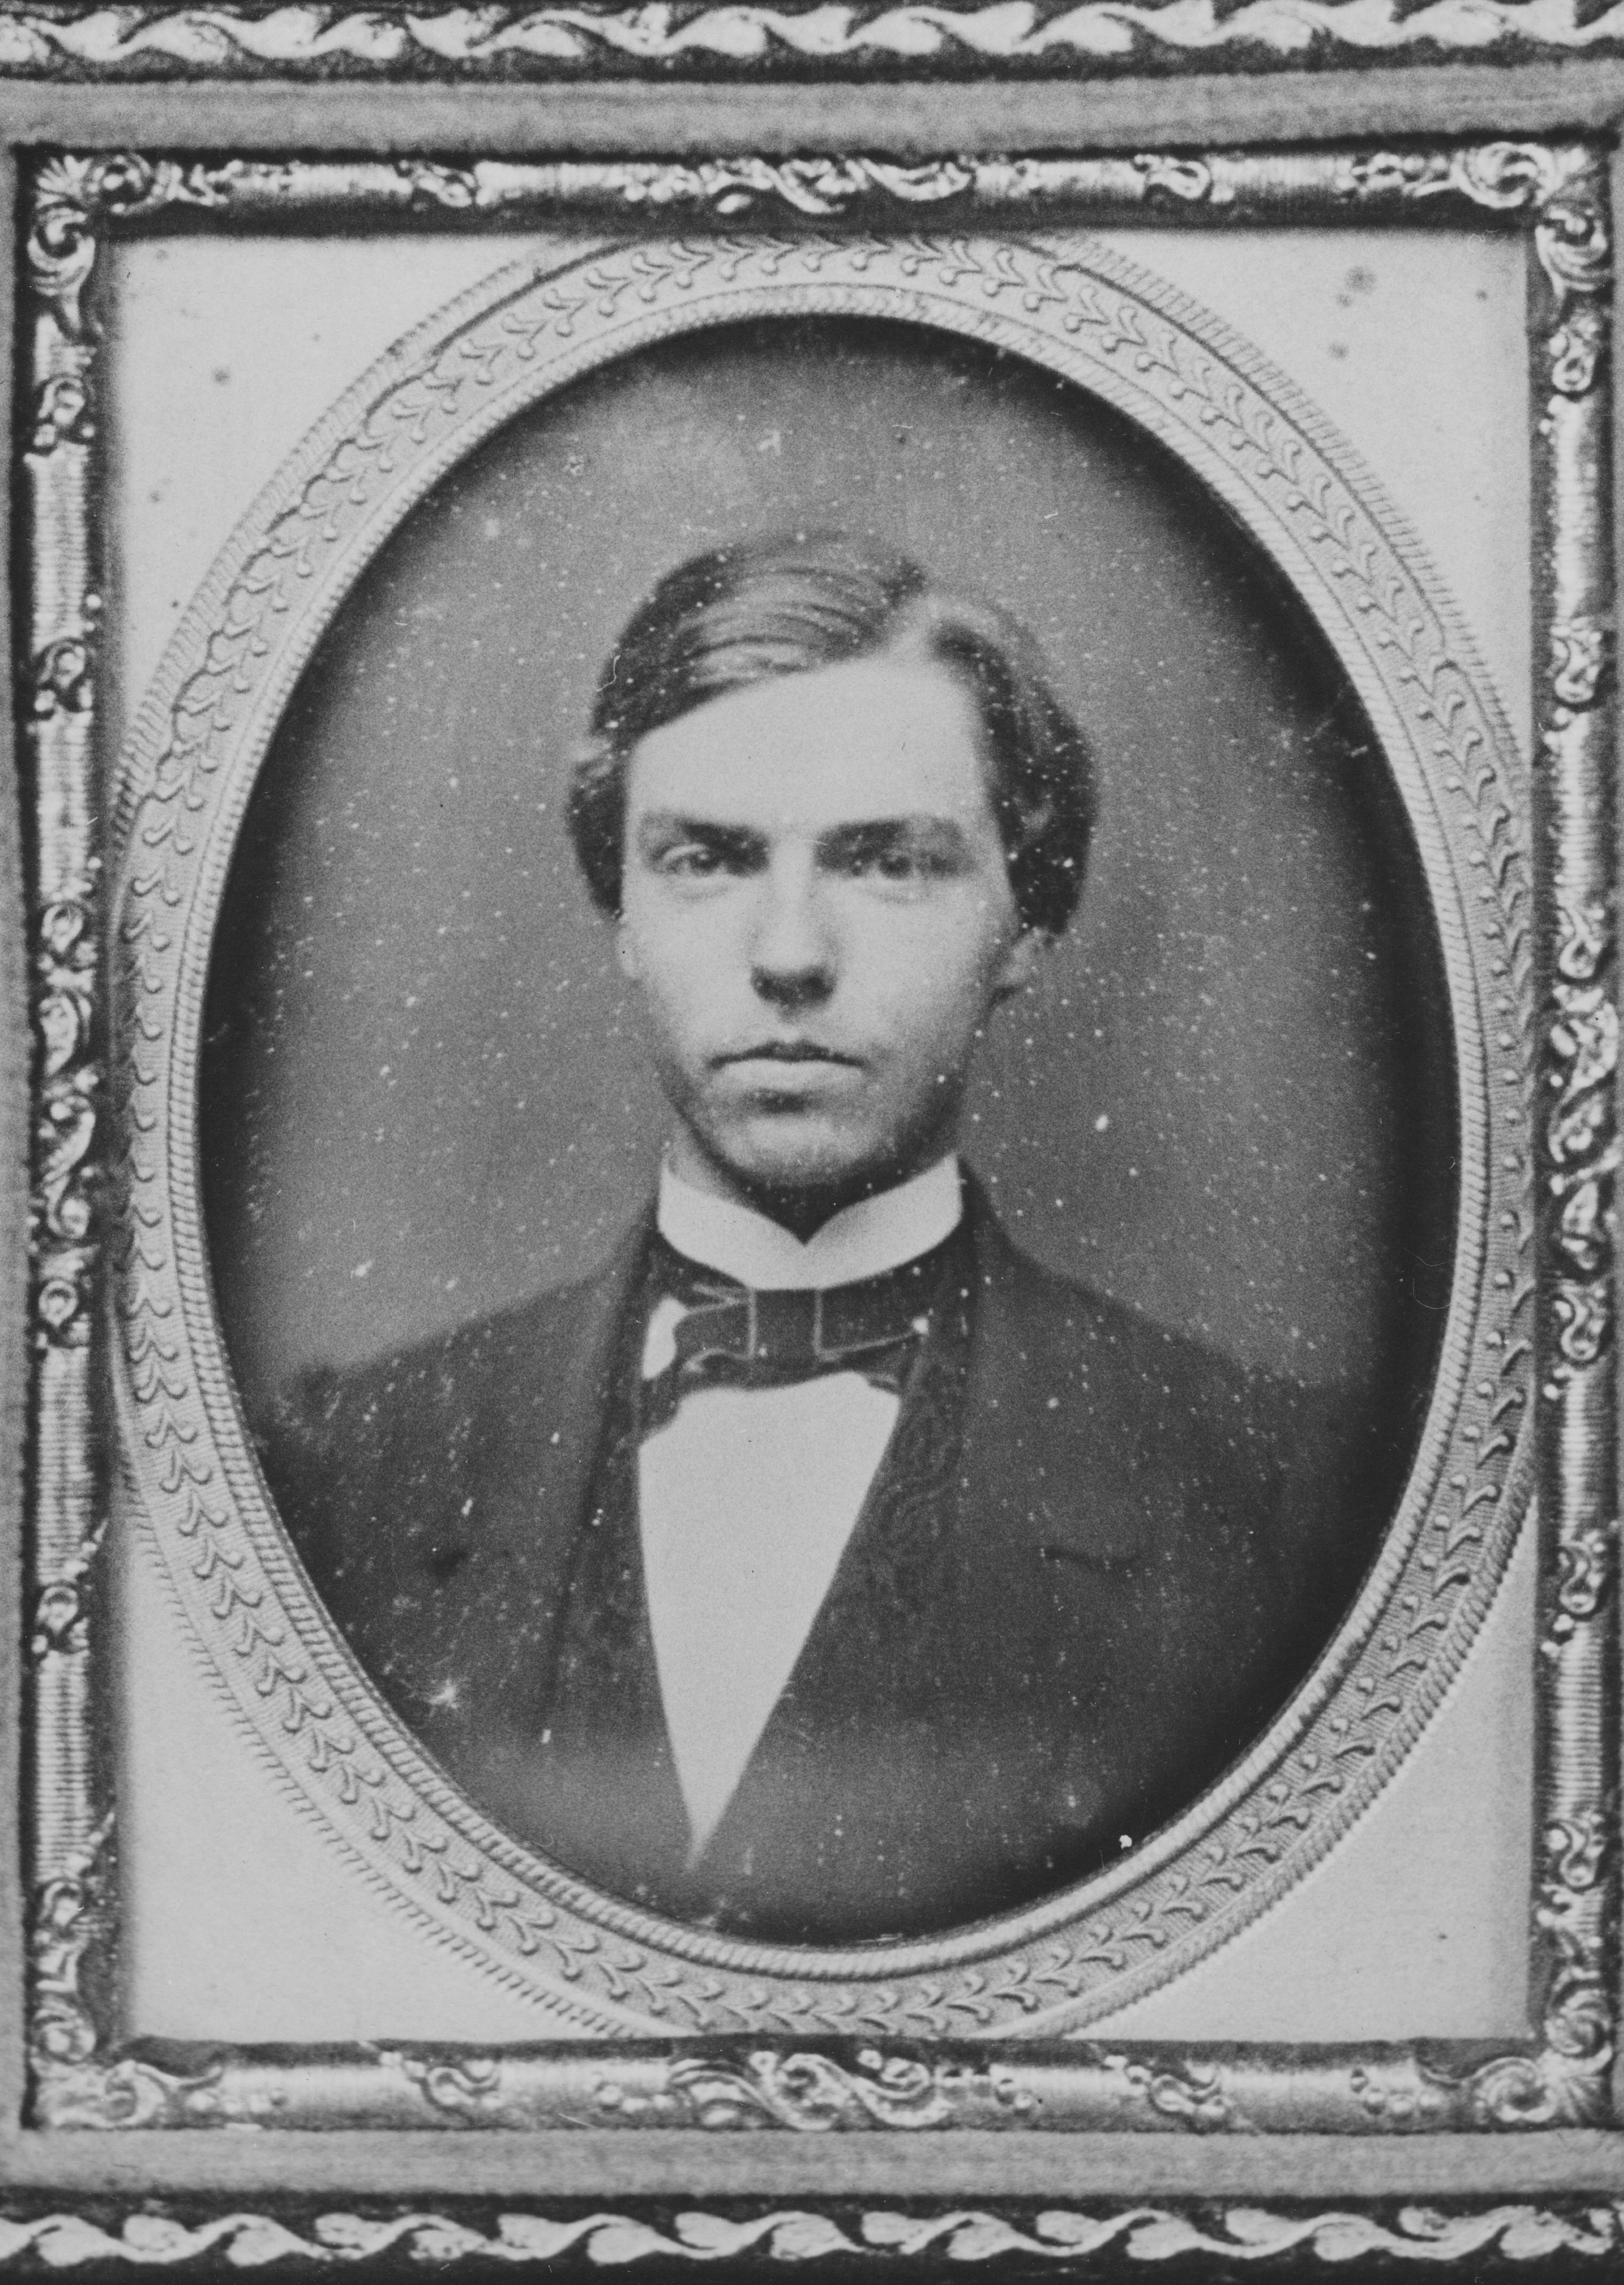 Francis Barnes, father of Hon. Charles P. Barnes